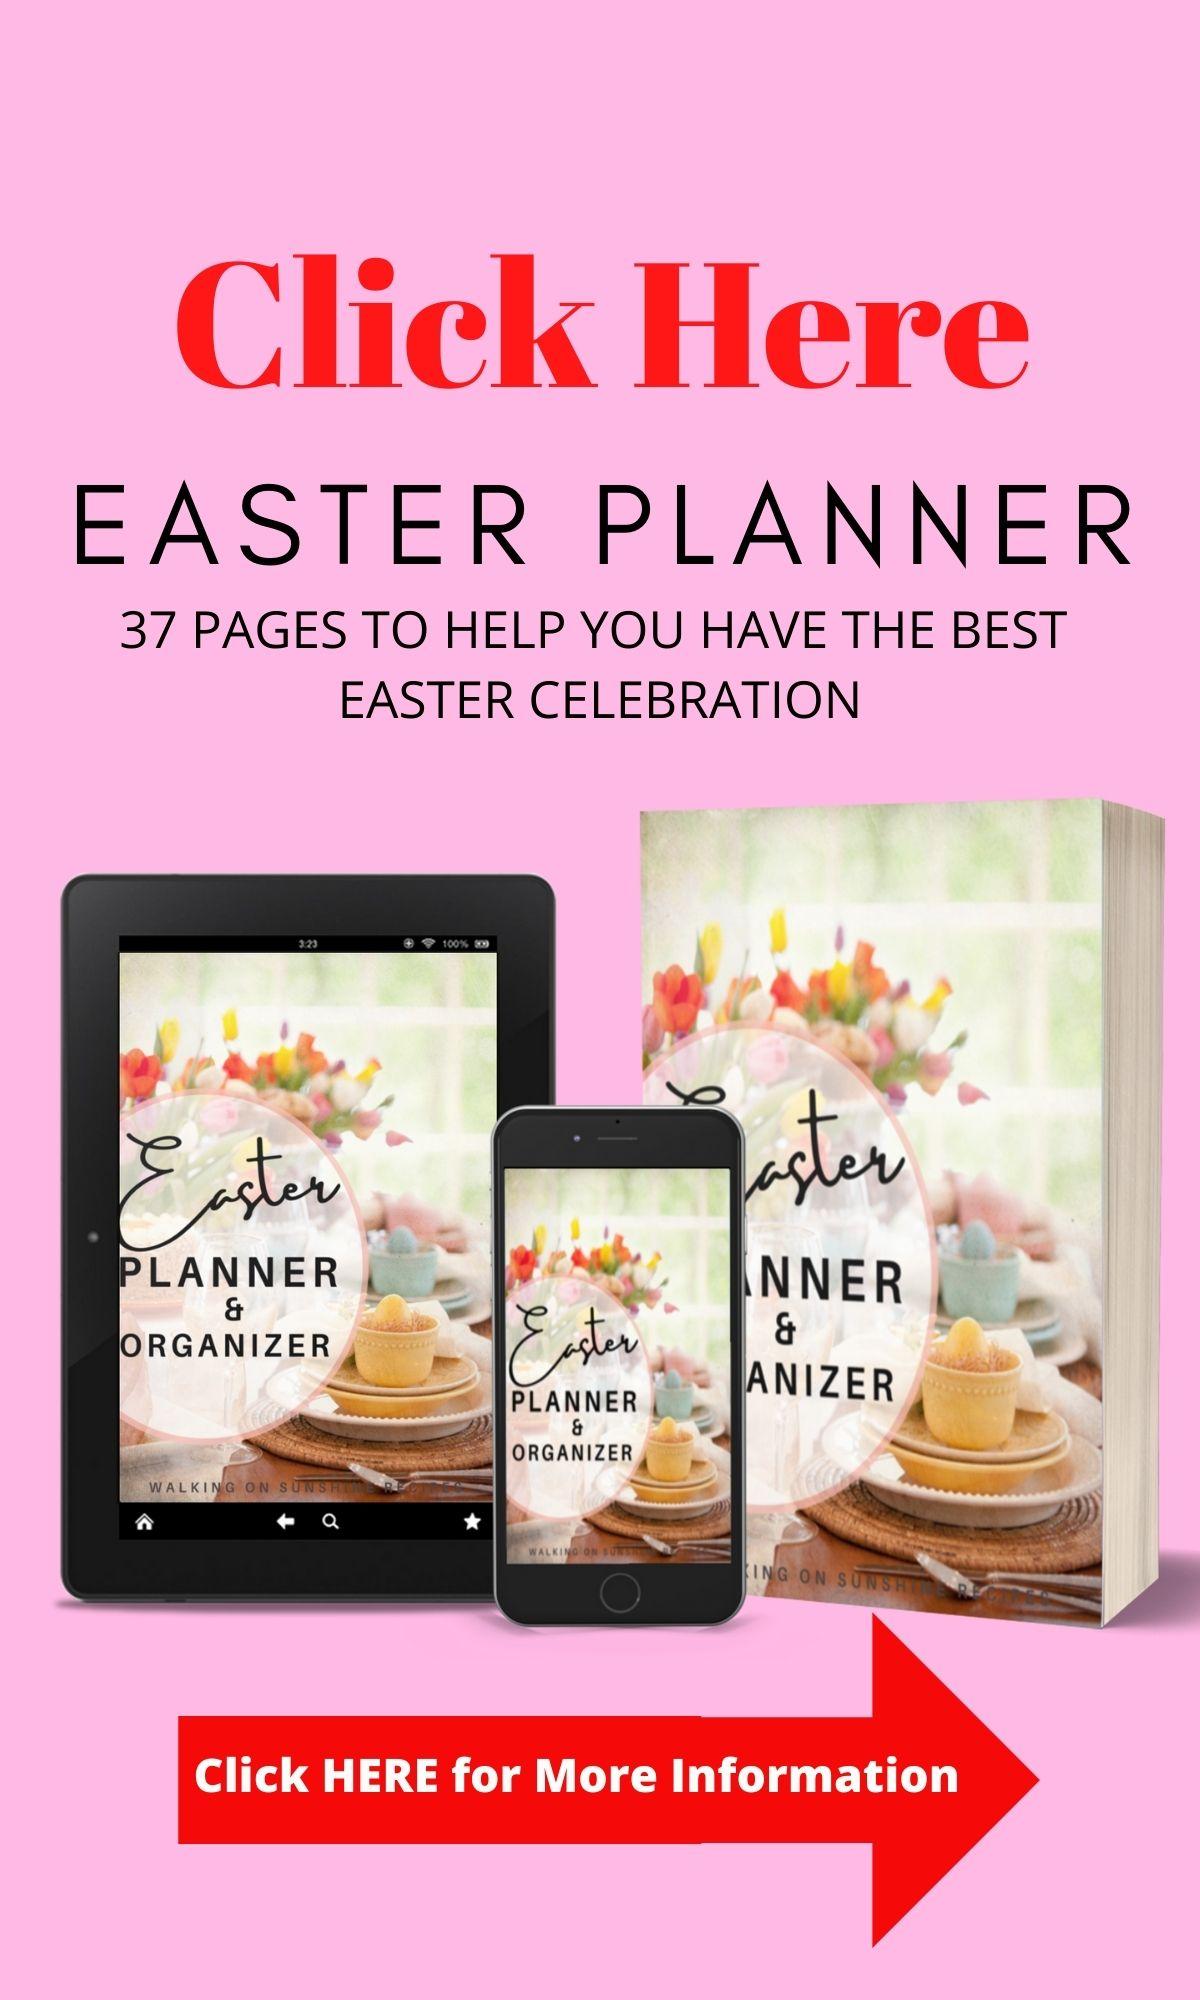 Easter-Planner-ggnoads.png LONG Blog Promo